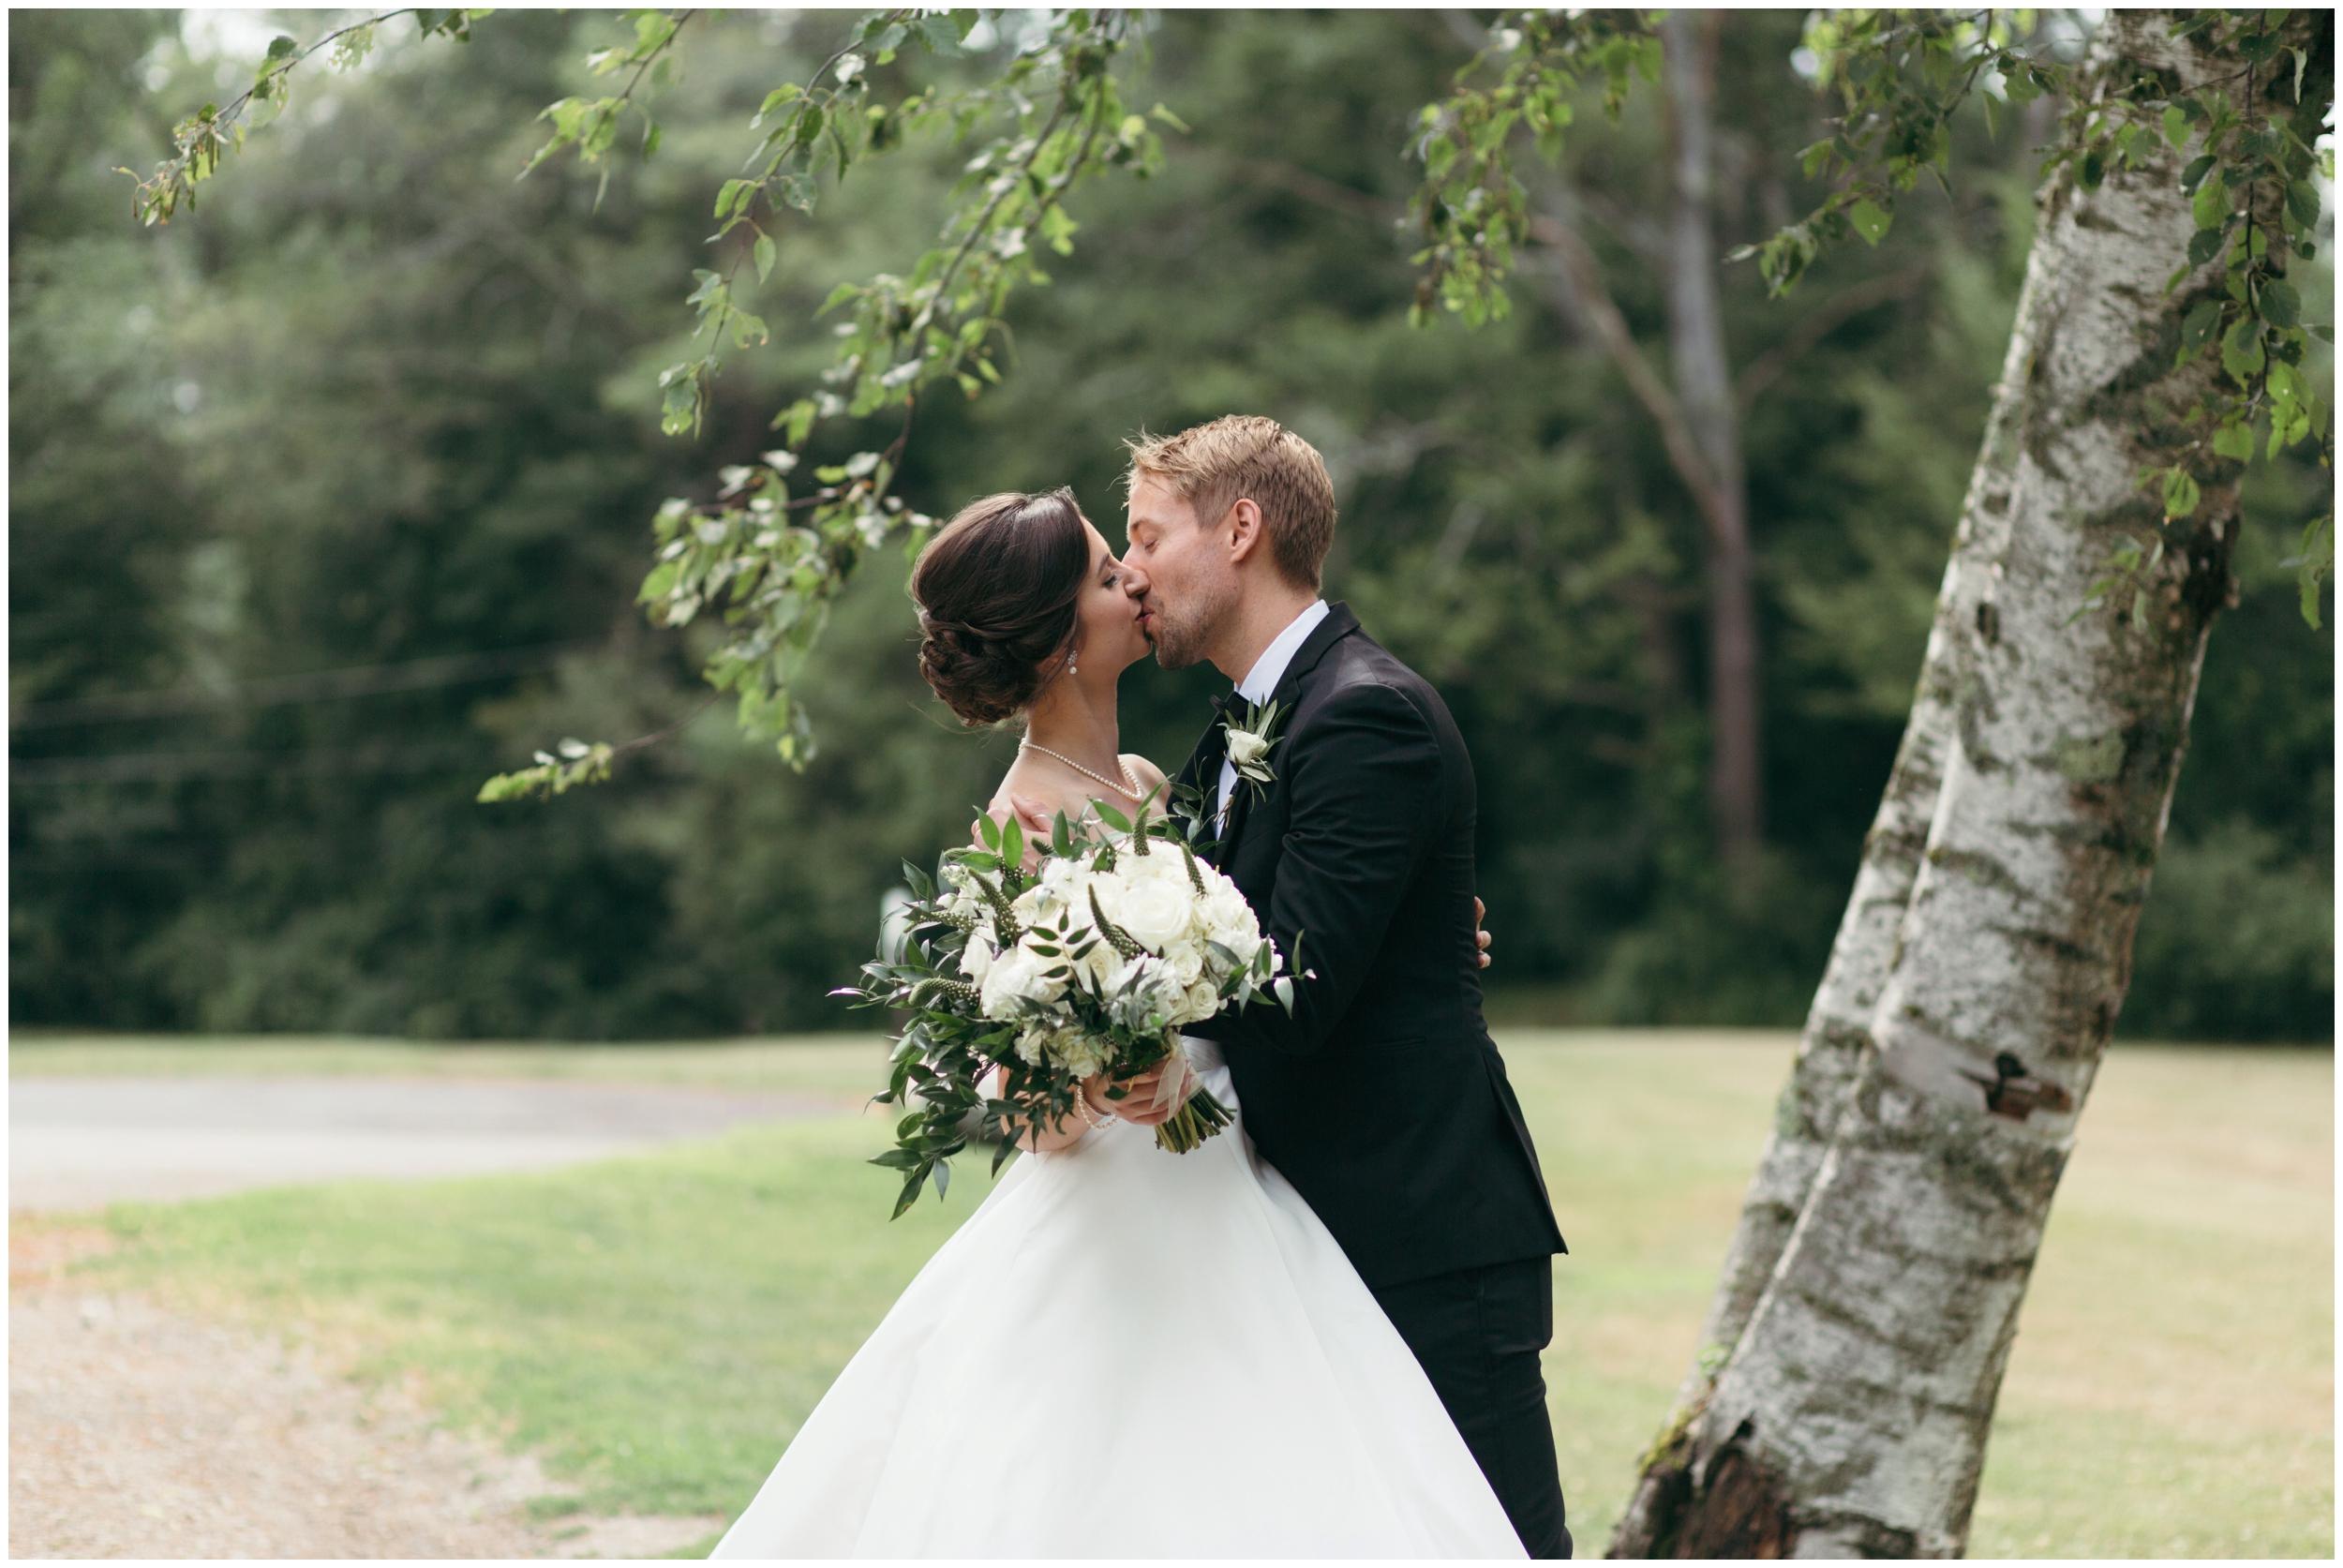 Willowdale-Estate-Wedding-Bailey-Q-Photo-Boston-Wedding-Photographer-011.JPG